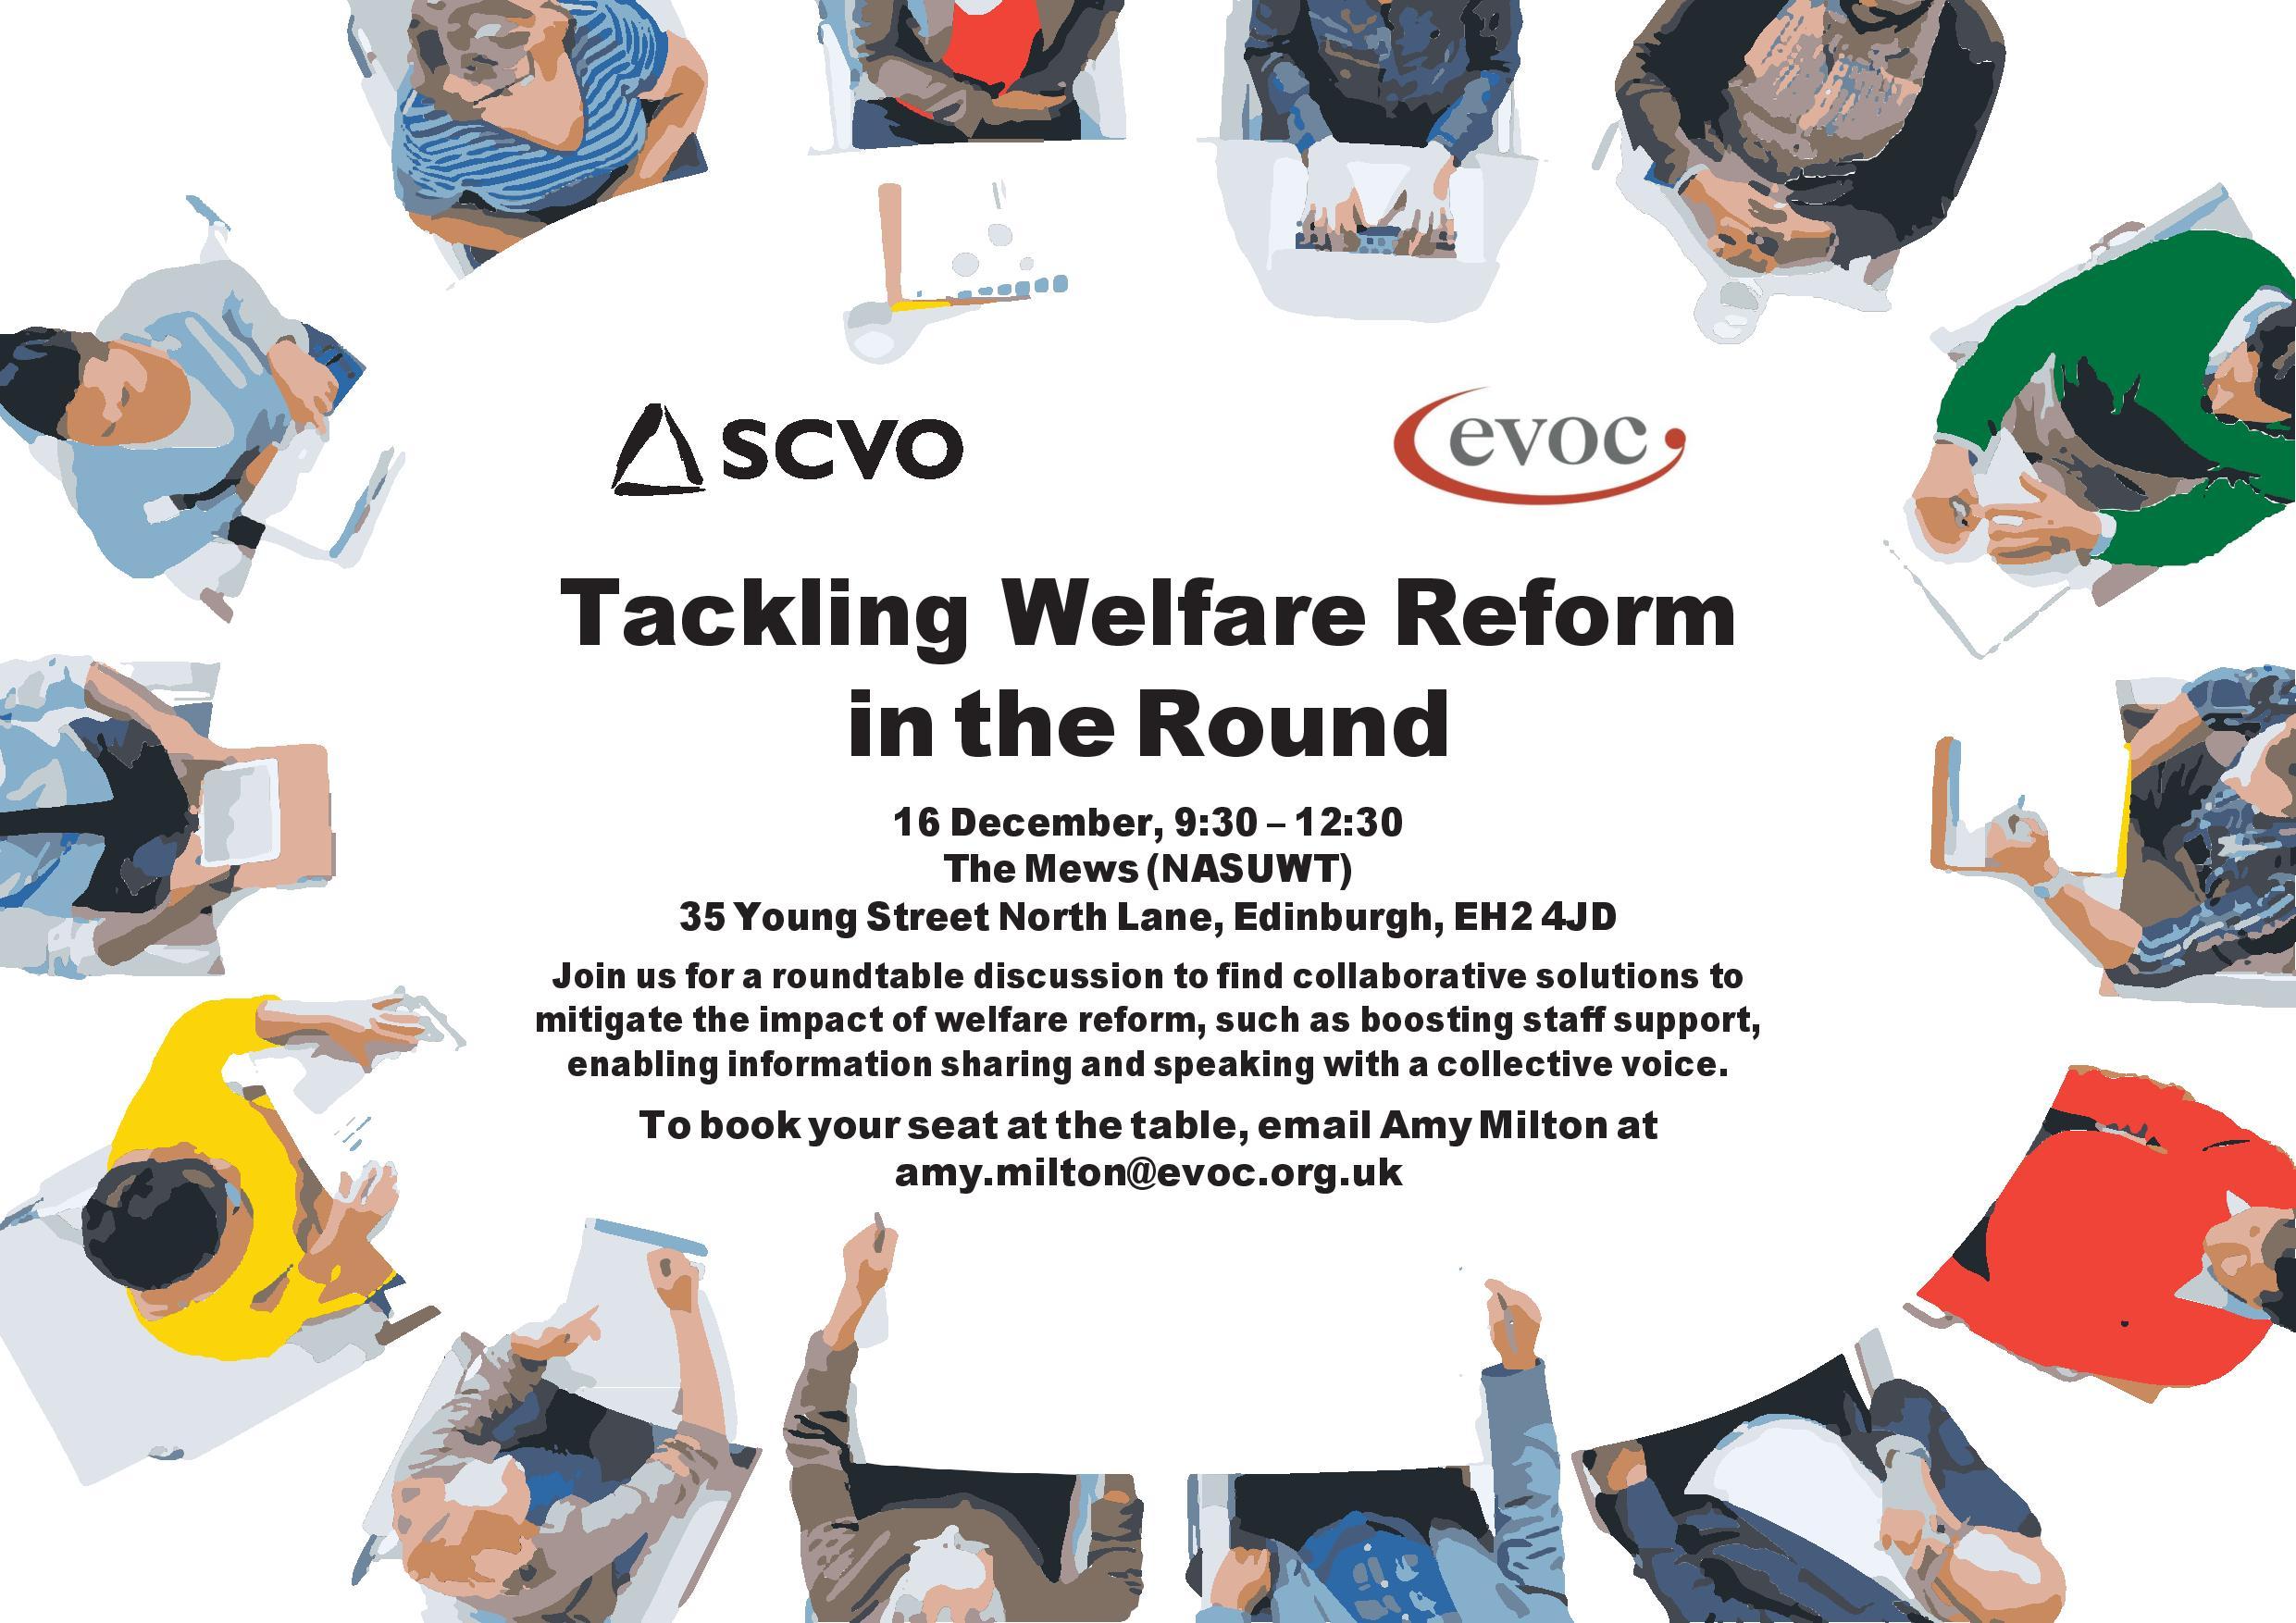 scvo-evoc-welfare-ref-roundtable-page-001